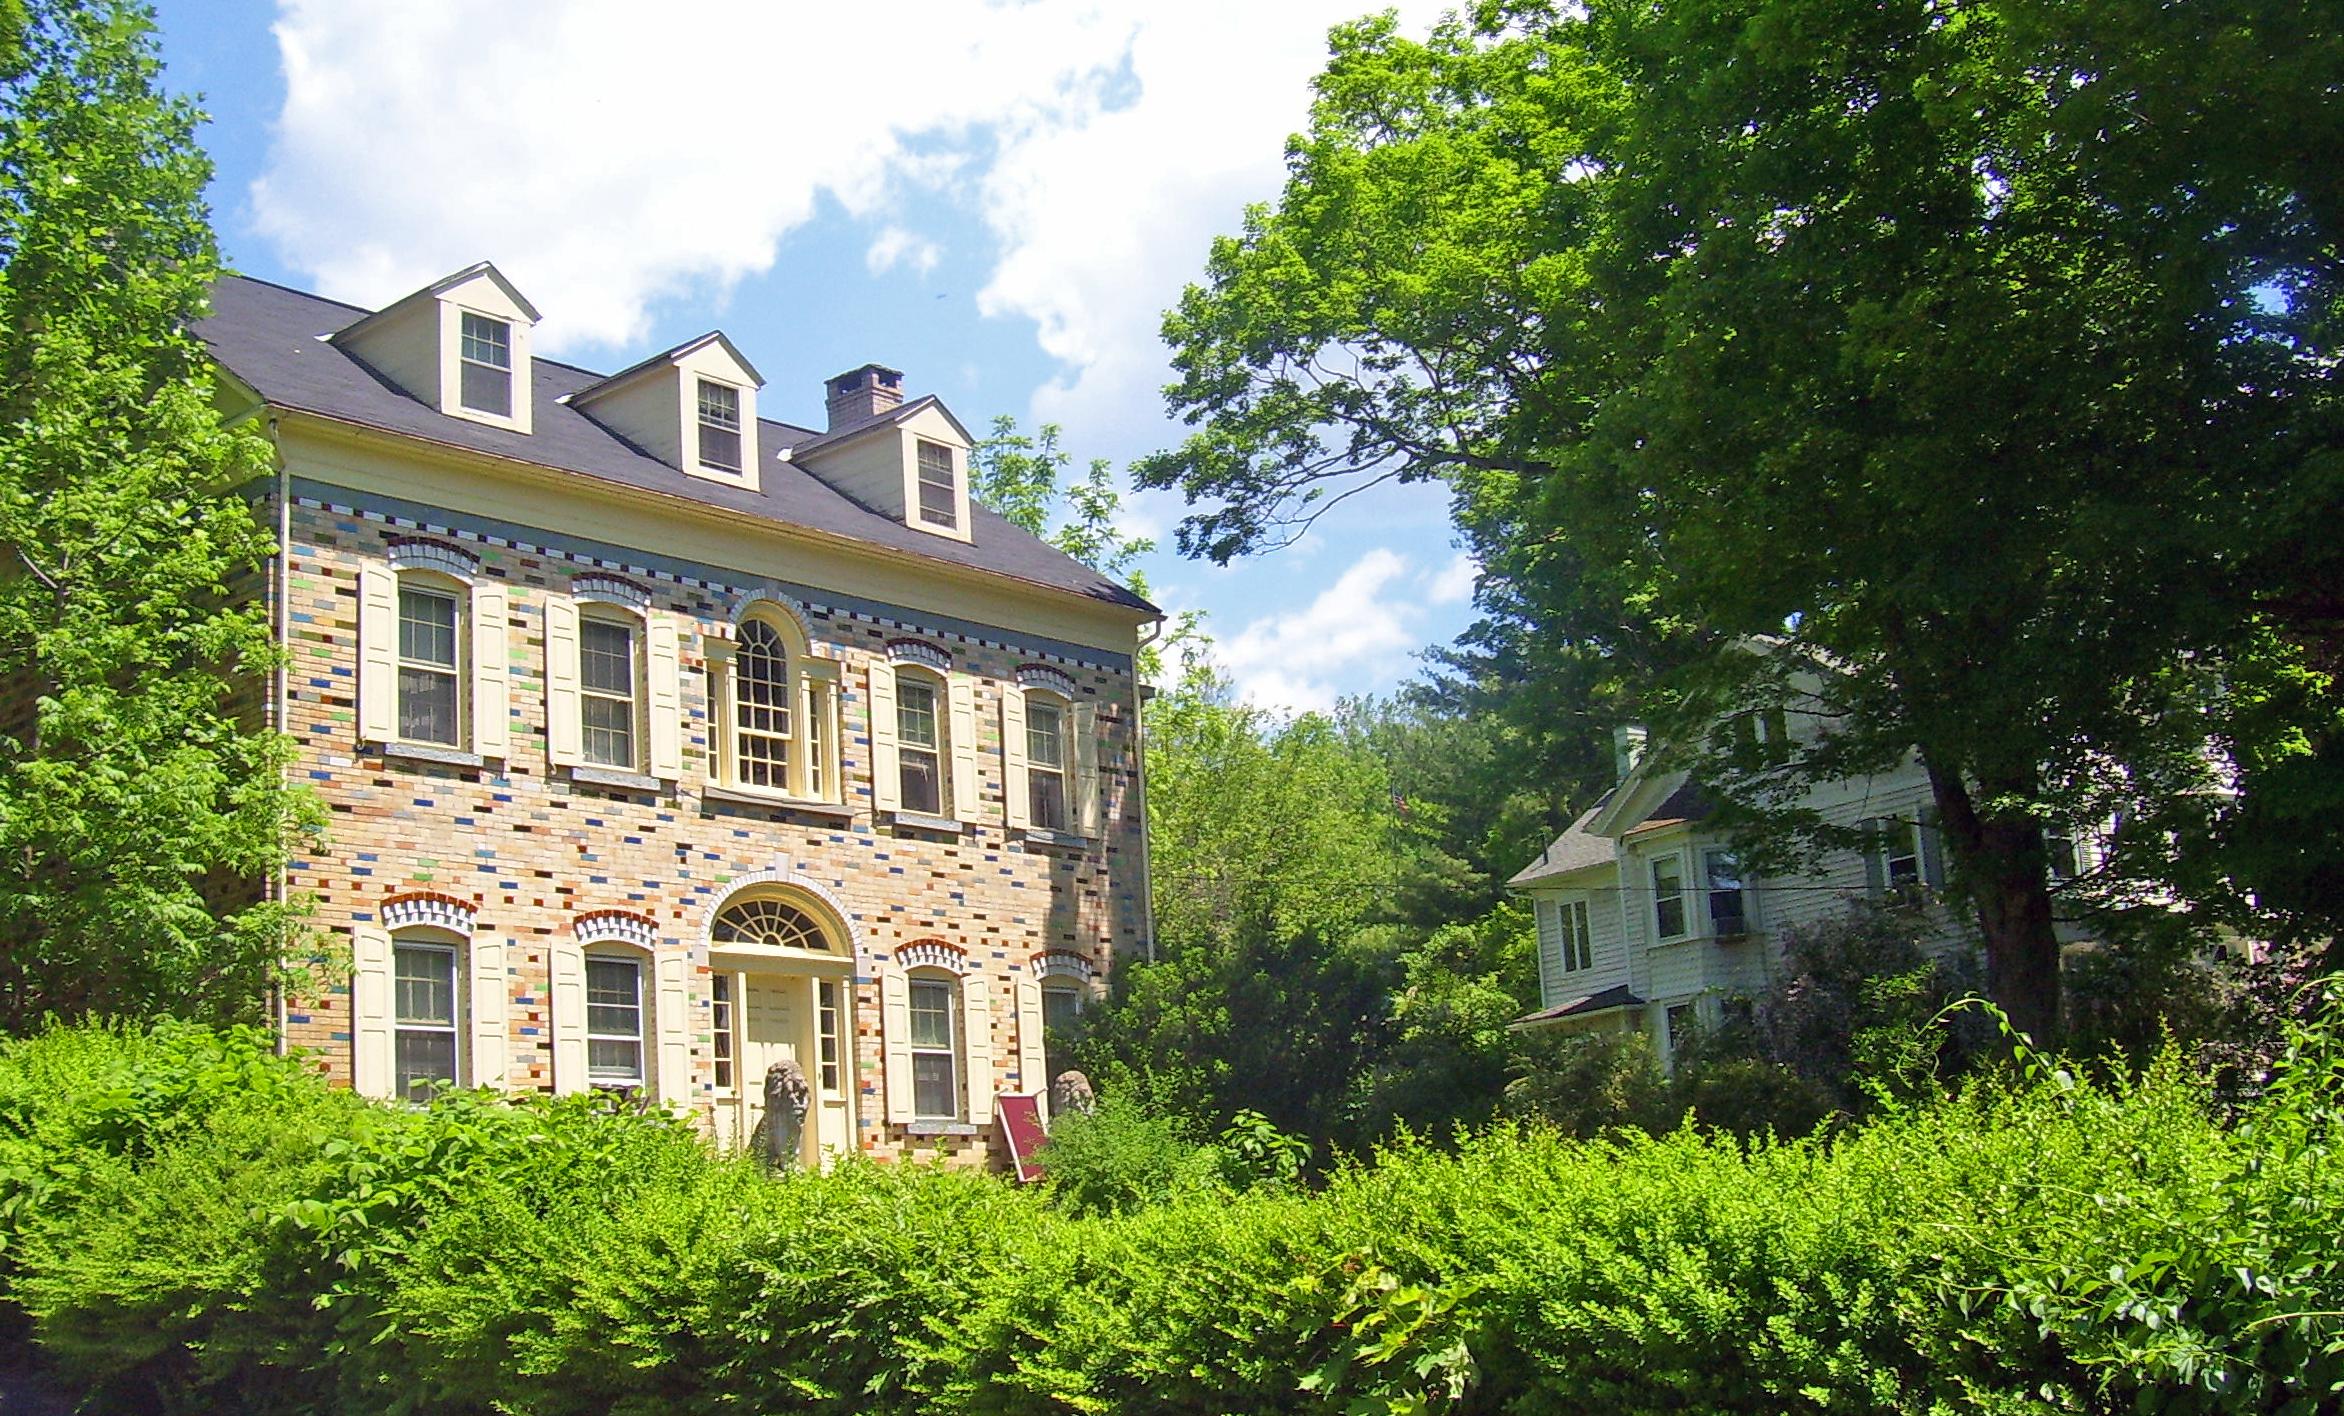 File snyder estate houses rosendale wikimedia for Estate house